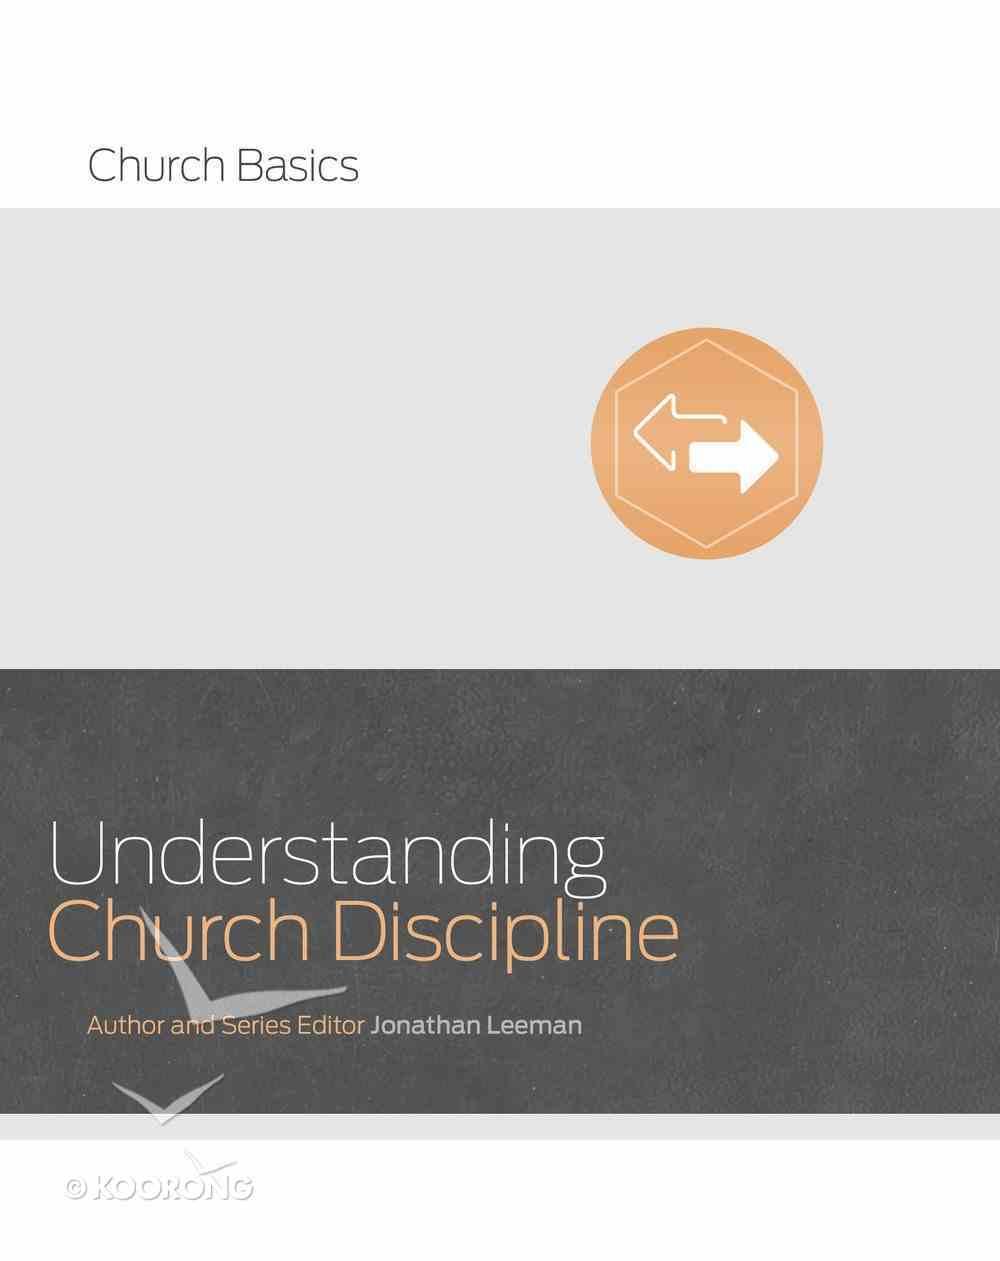 Understanding Church Discipline (Church Basics Series) Paperback